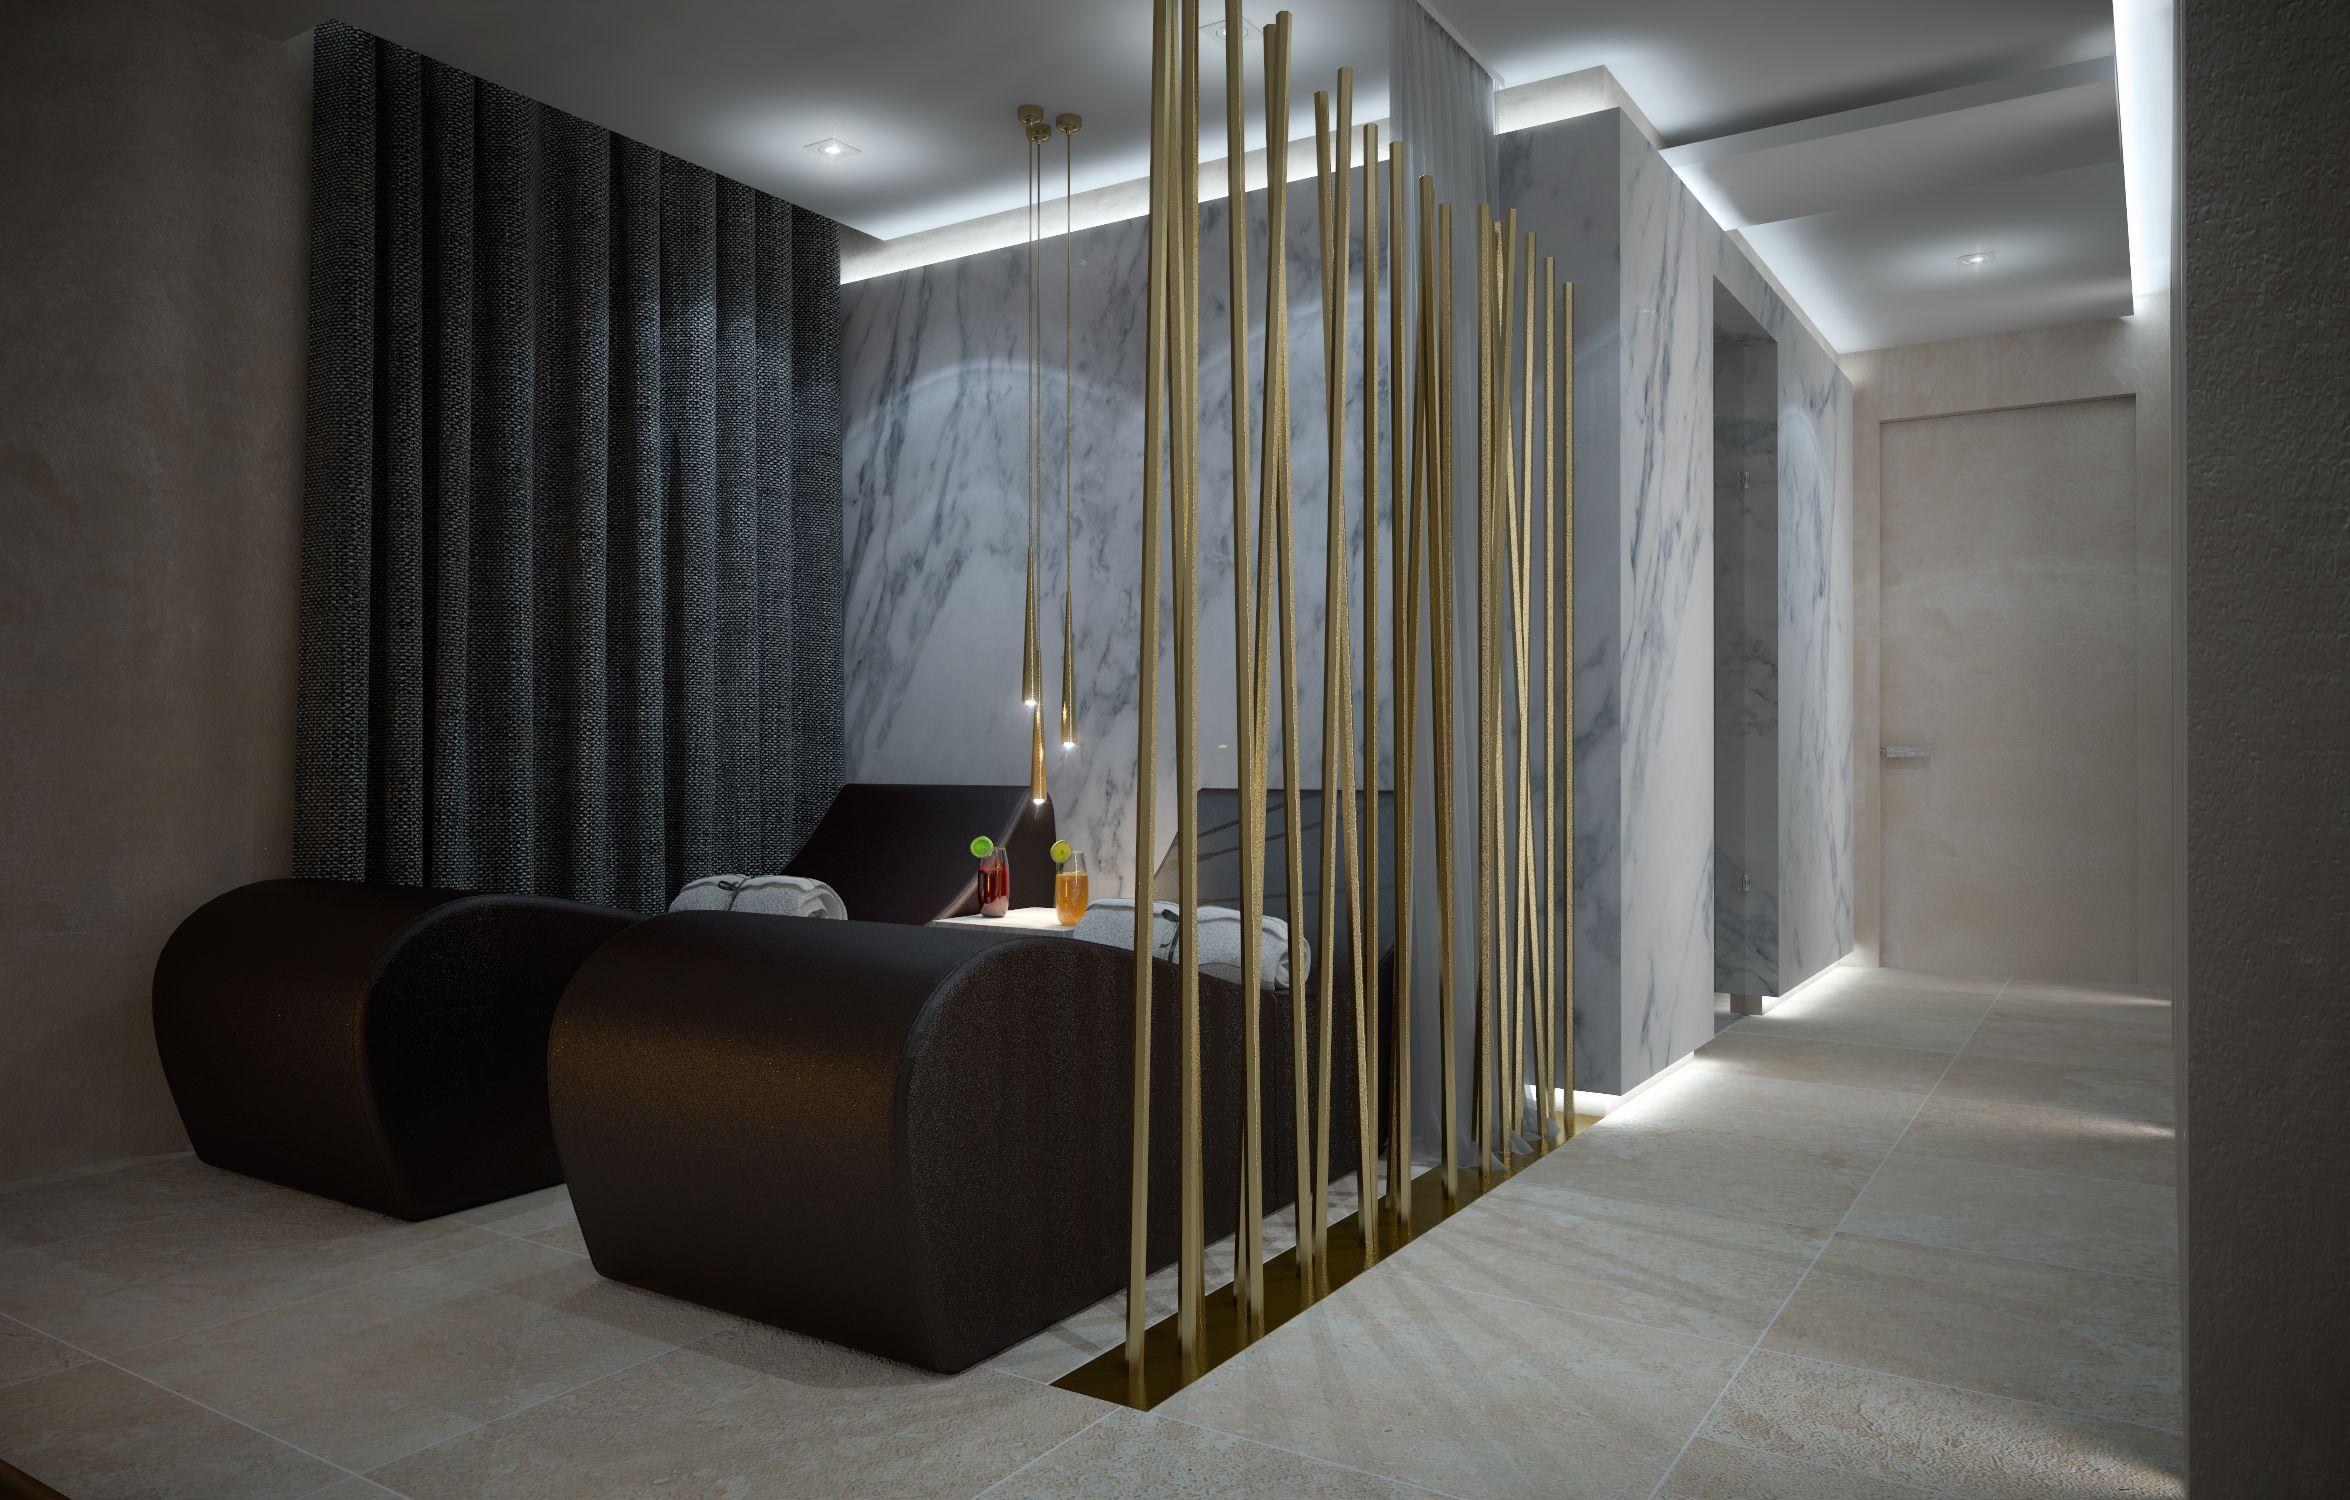 Salon of beauty. Spa designed by Arno Architetture. Starlongue by Starpool